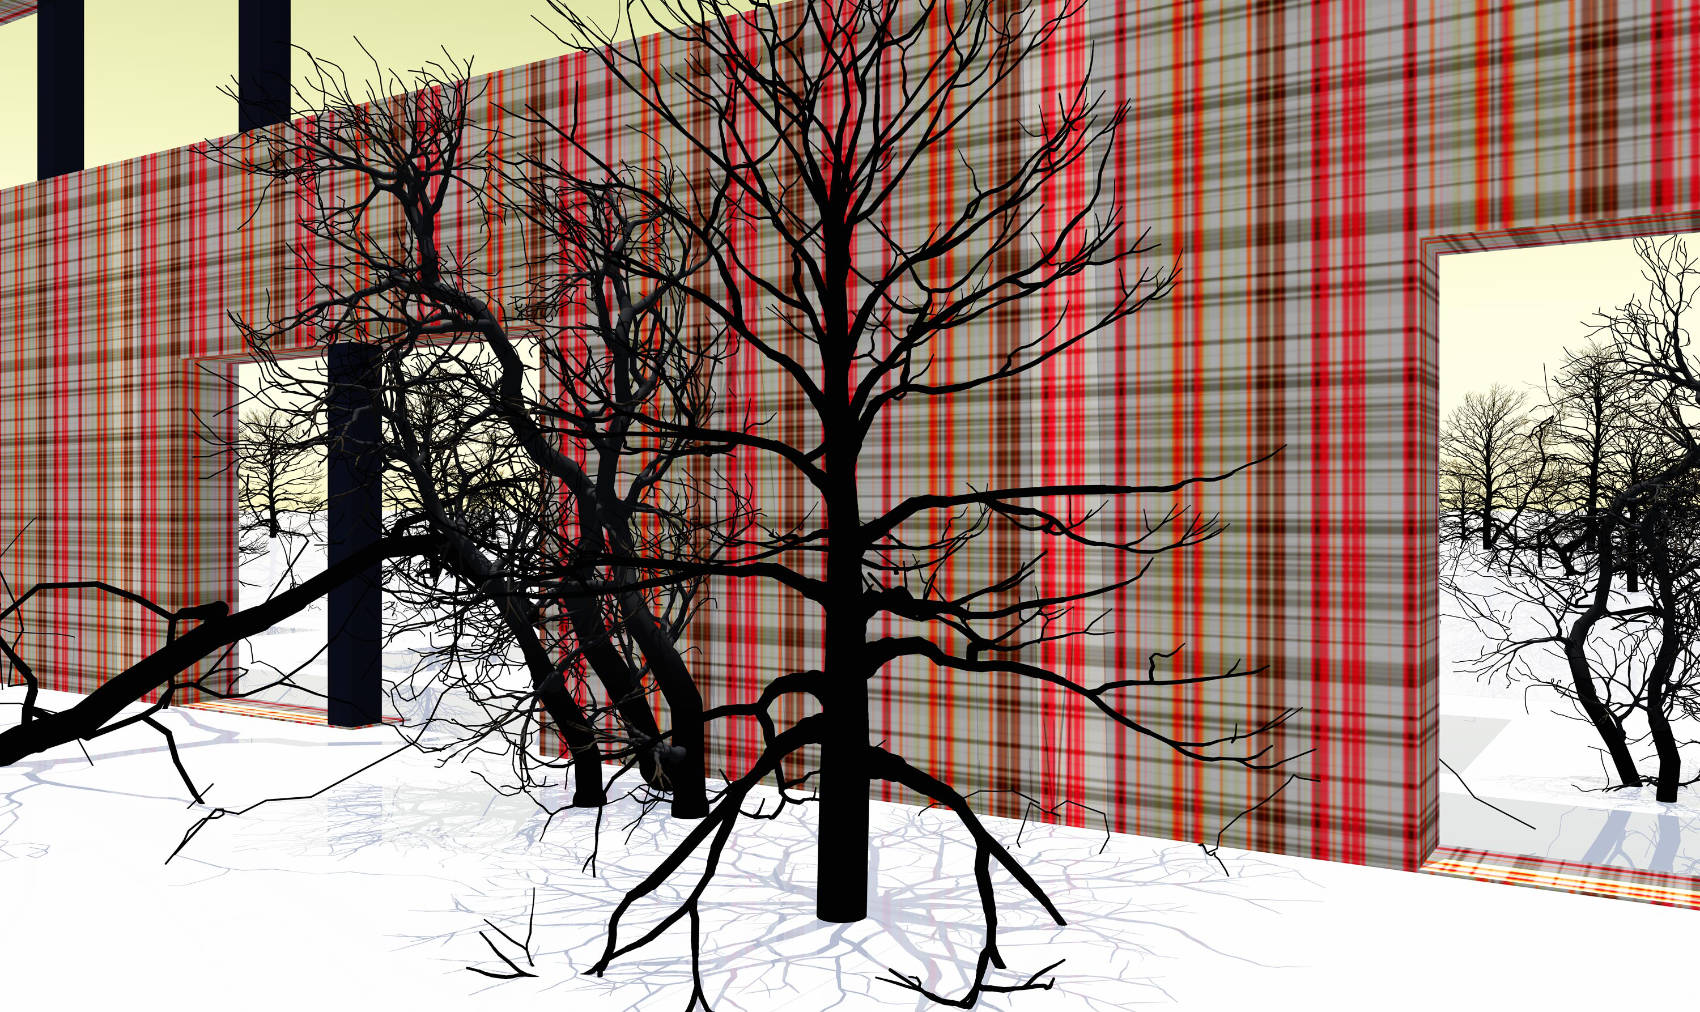 Indoor Landscape 6, 2015, Jet d'encre, 56 x 94 cm